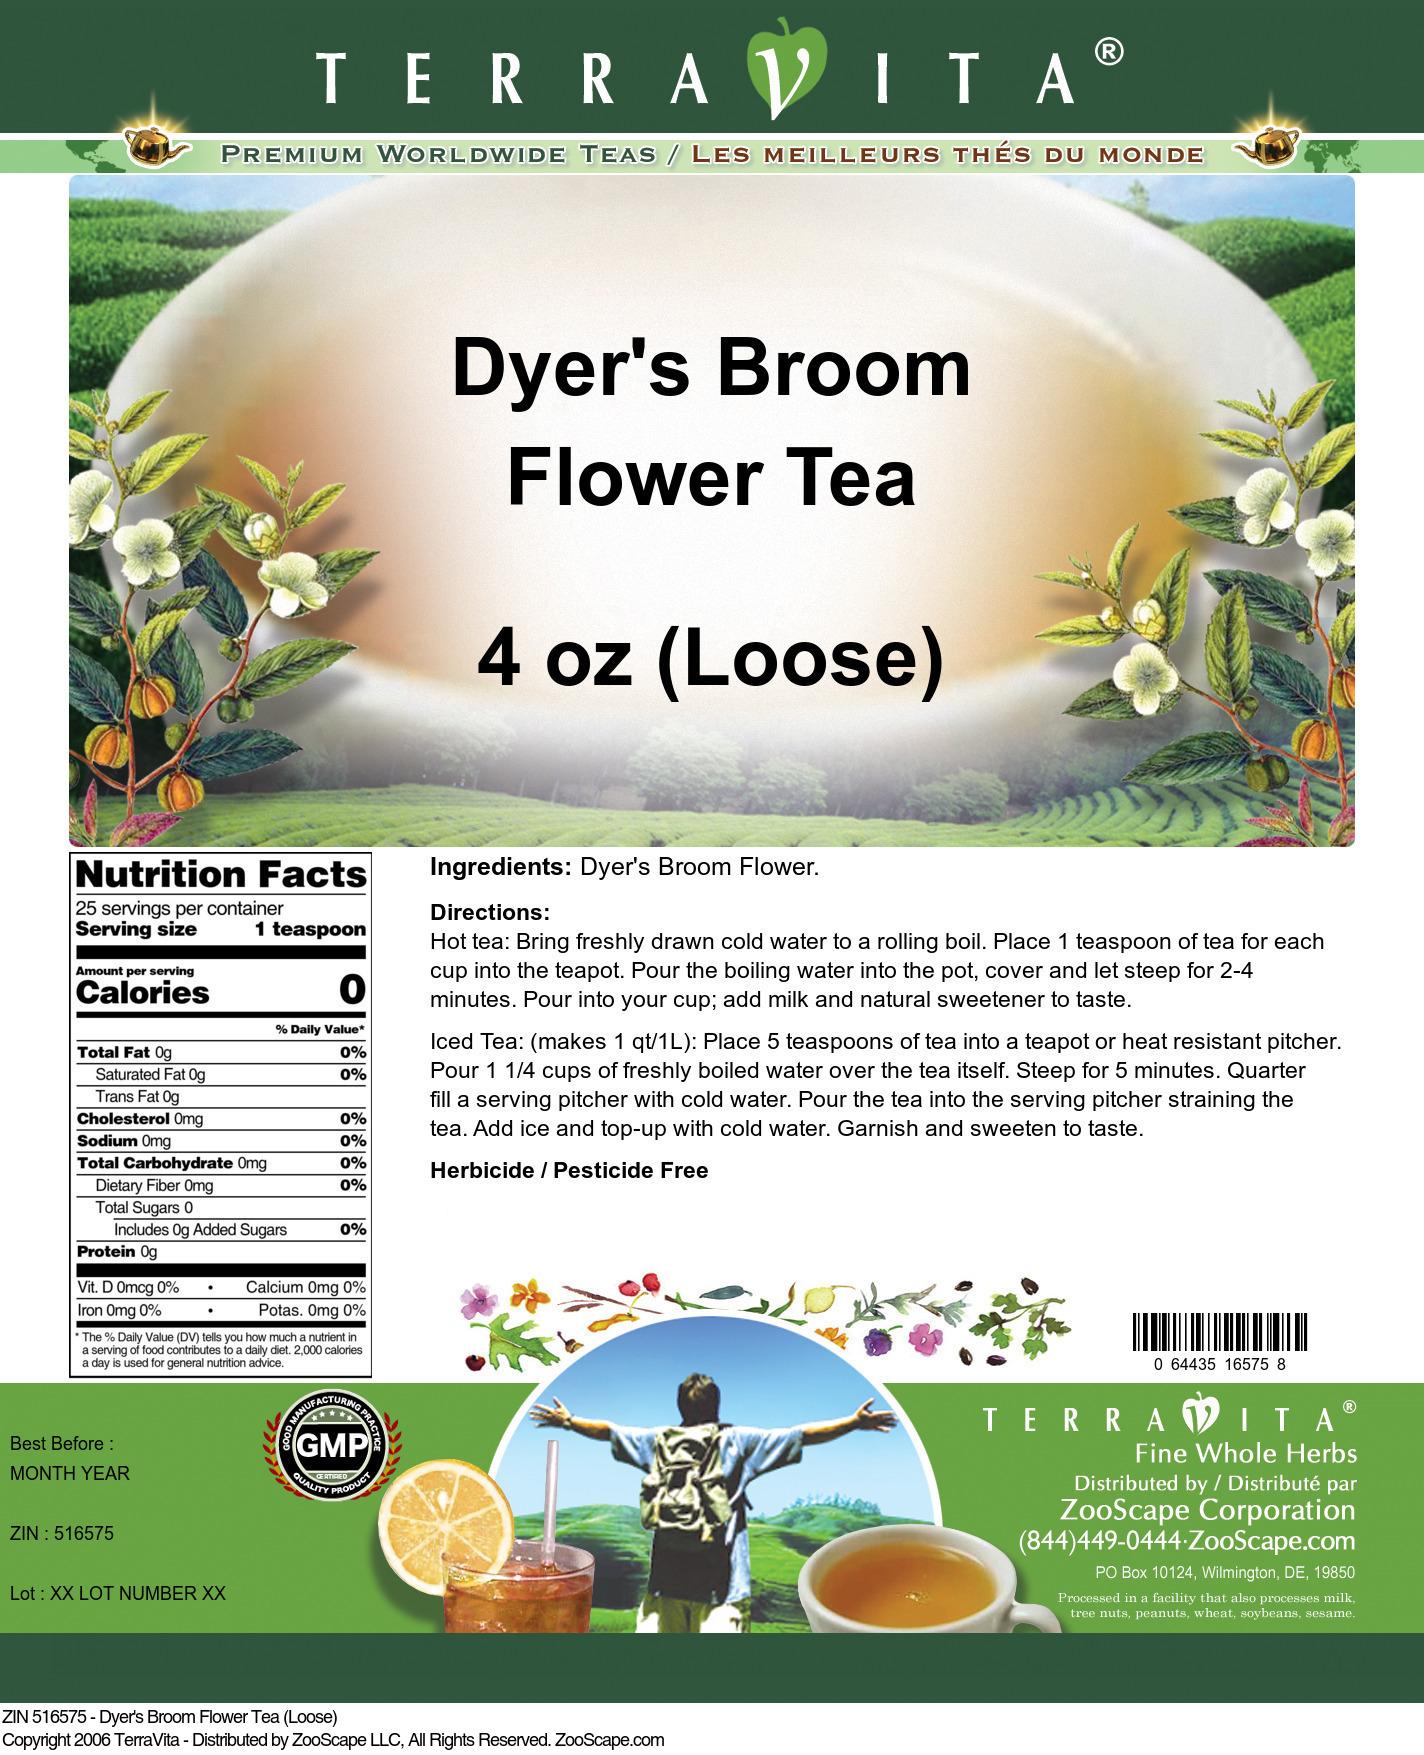 Dyer's Broom Flower Tea (Loose)